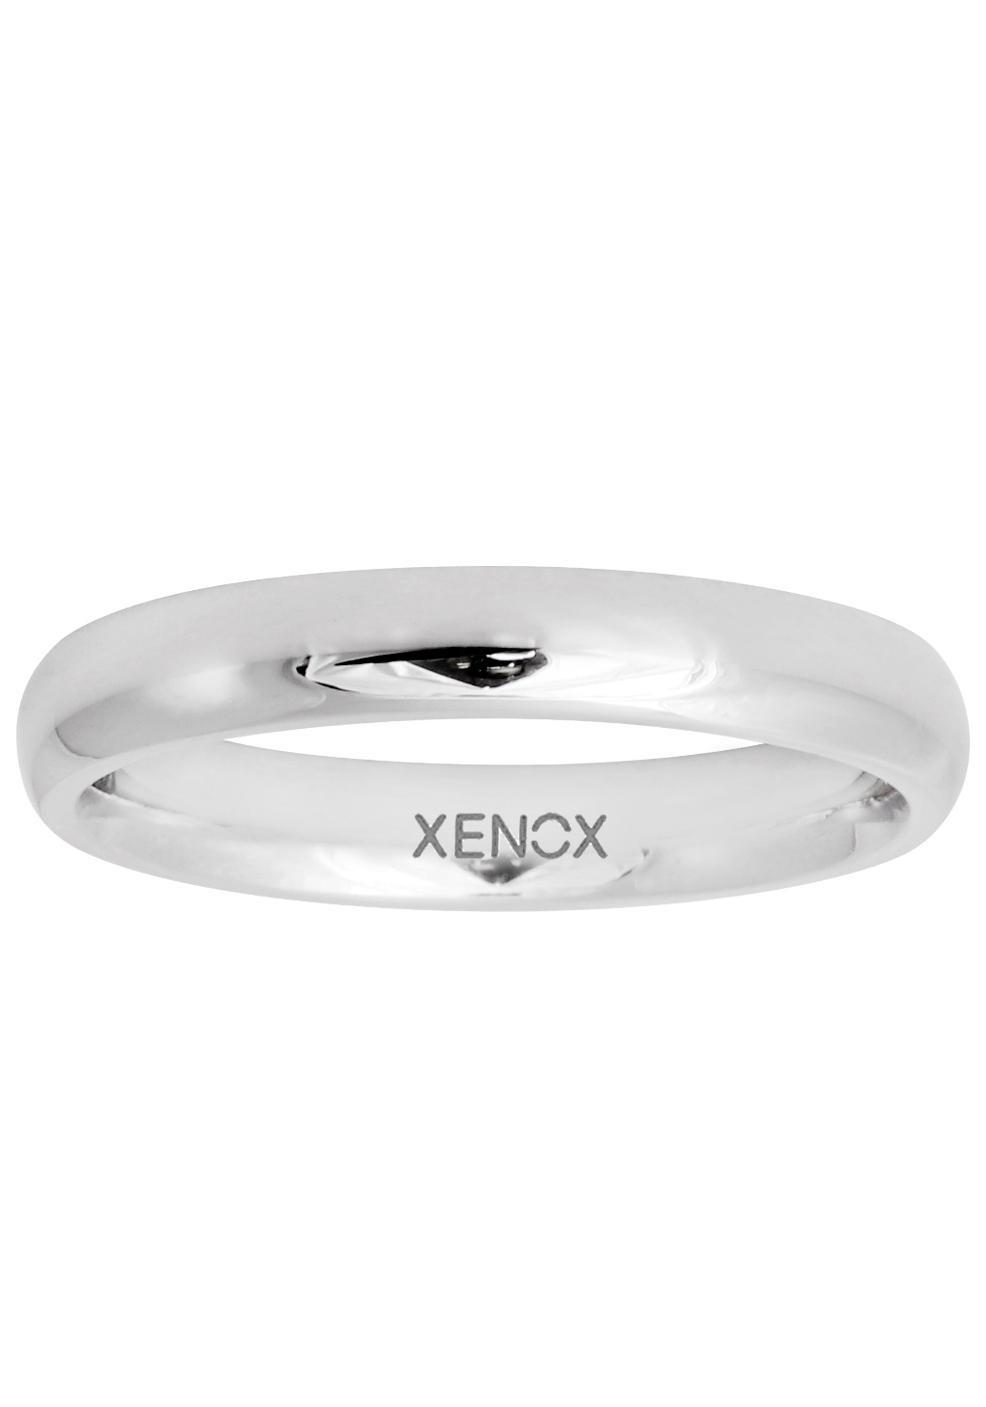 XENOX Partnerring »XENOX & friends, X5010, X5011« | Schmuck > Ringe > Partnerringe | XENOX